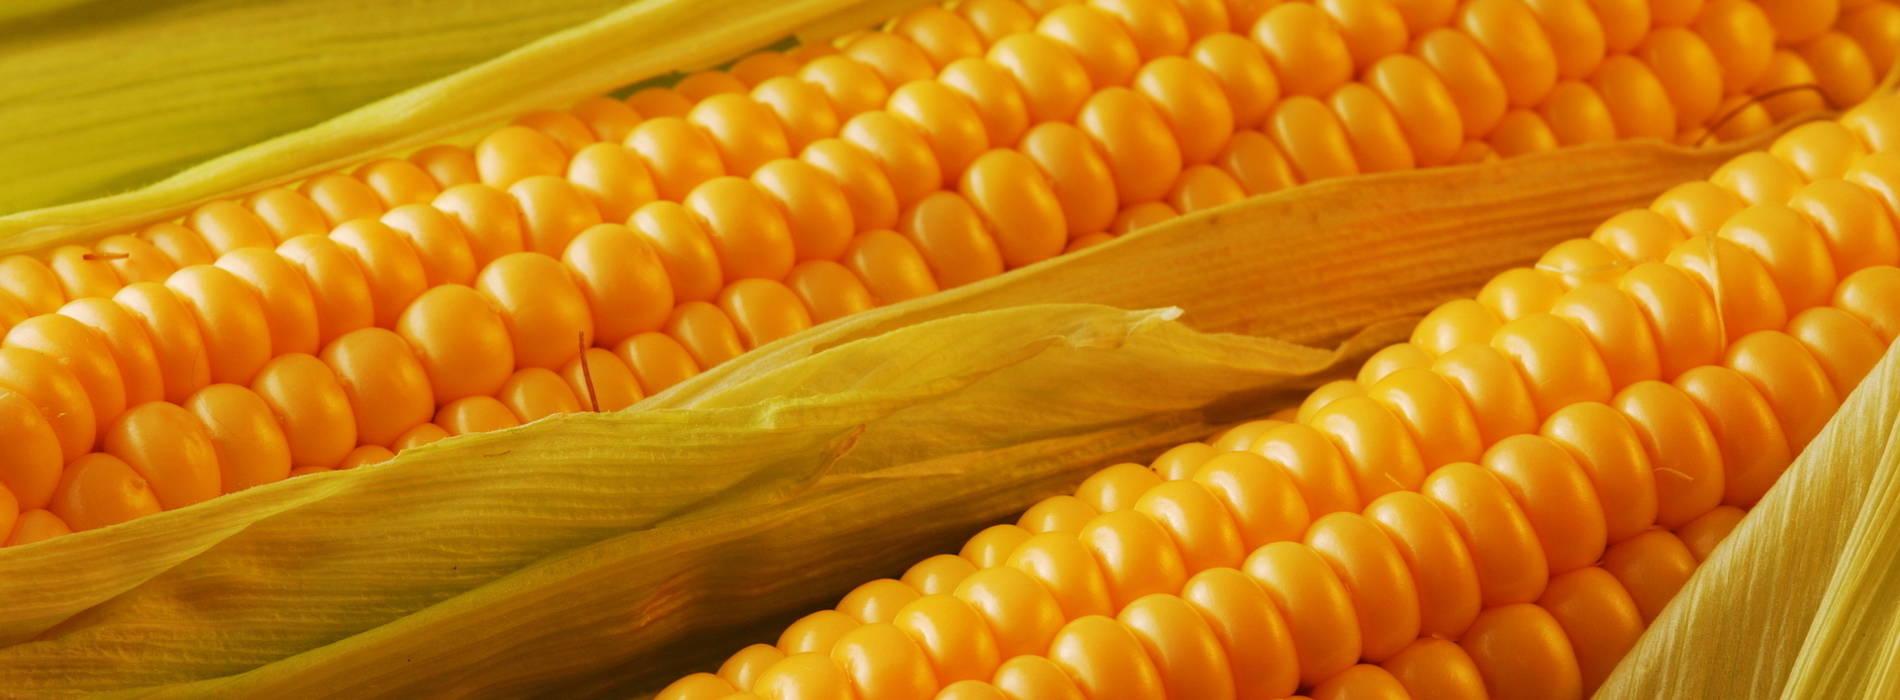 Kapiri farmers reject fra maize price agri business zambia kapiri farmers reject fra maize price voltagebd Image collections